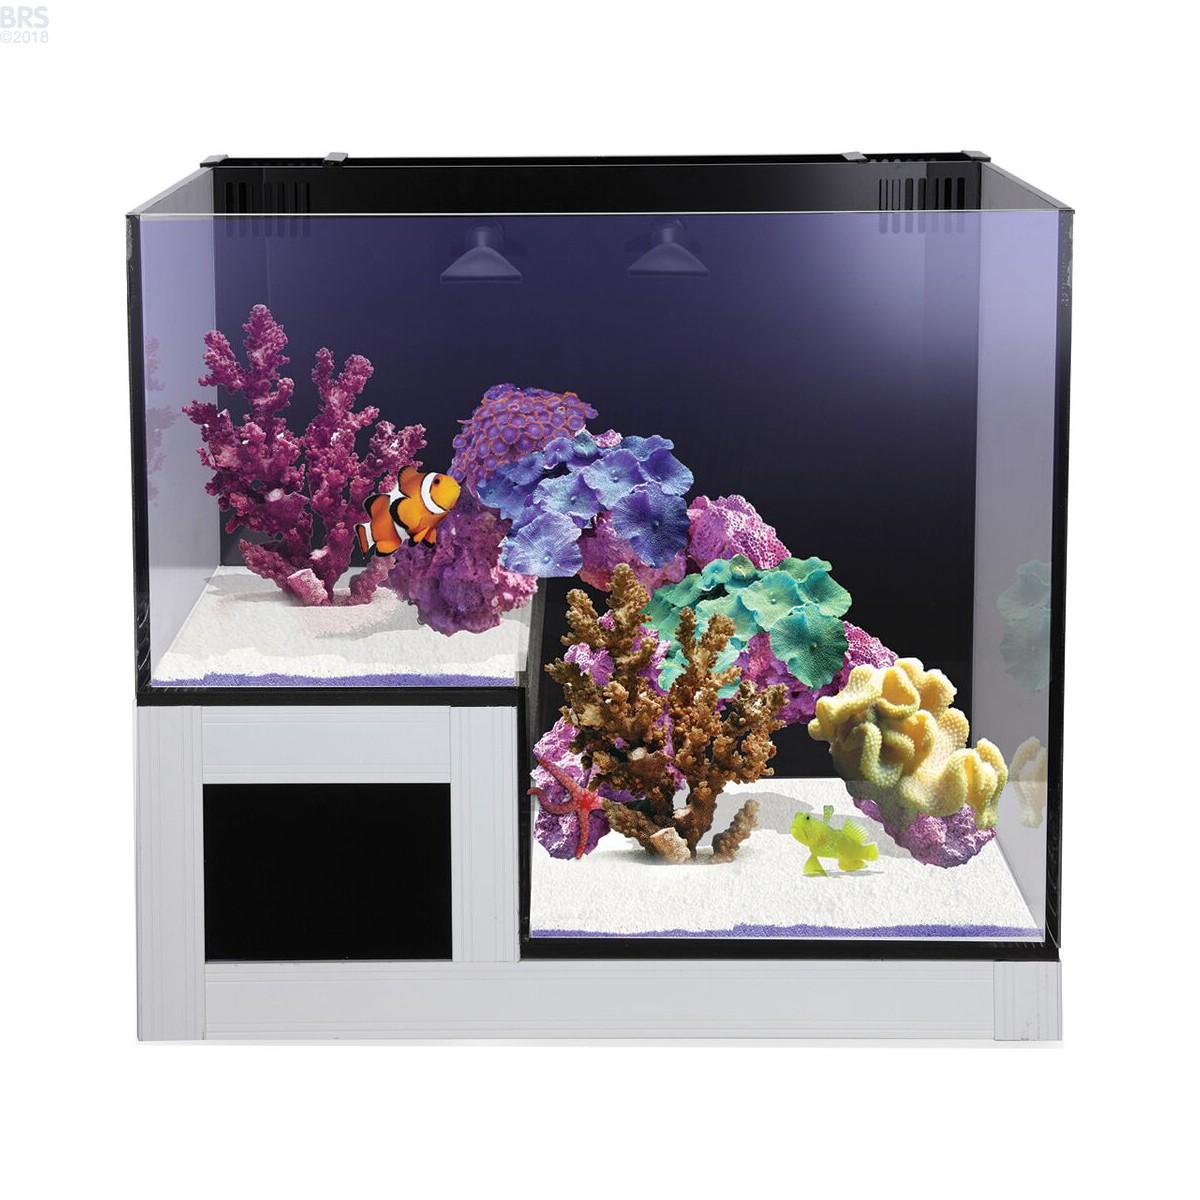 Concept Glass Abyss Panorama 20g Aio Aquarium Innovative